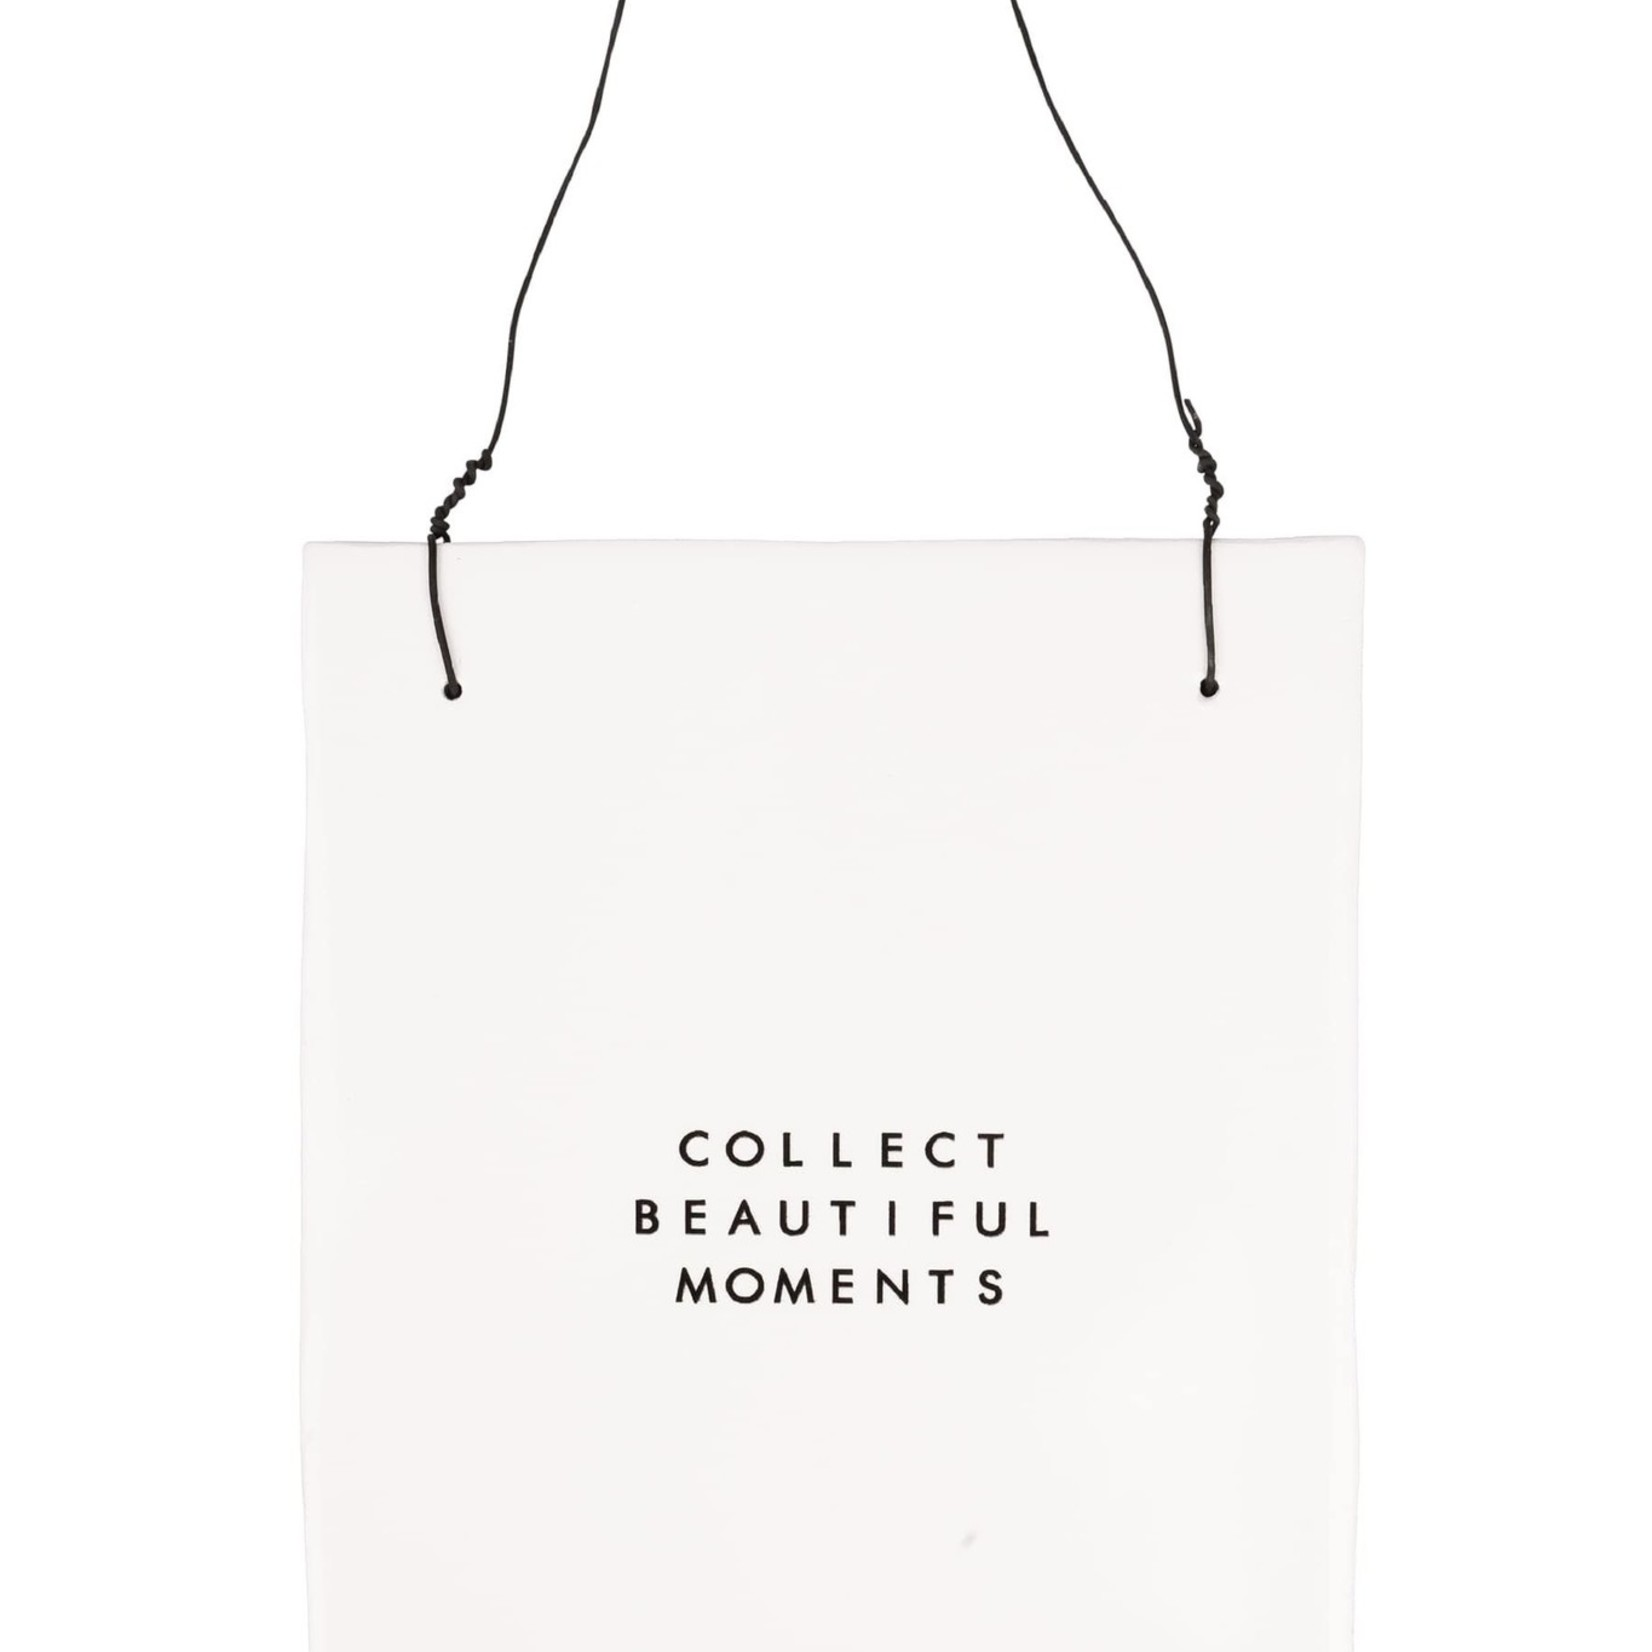 "Tekst tegeltje ""Collect moments"" - Zusss"